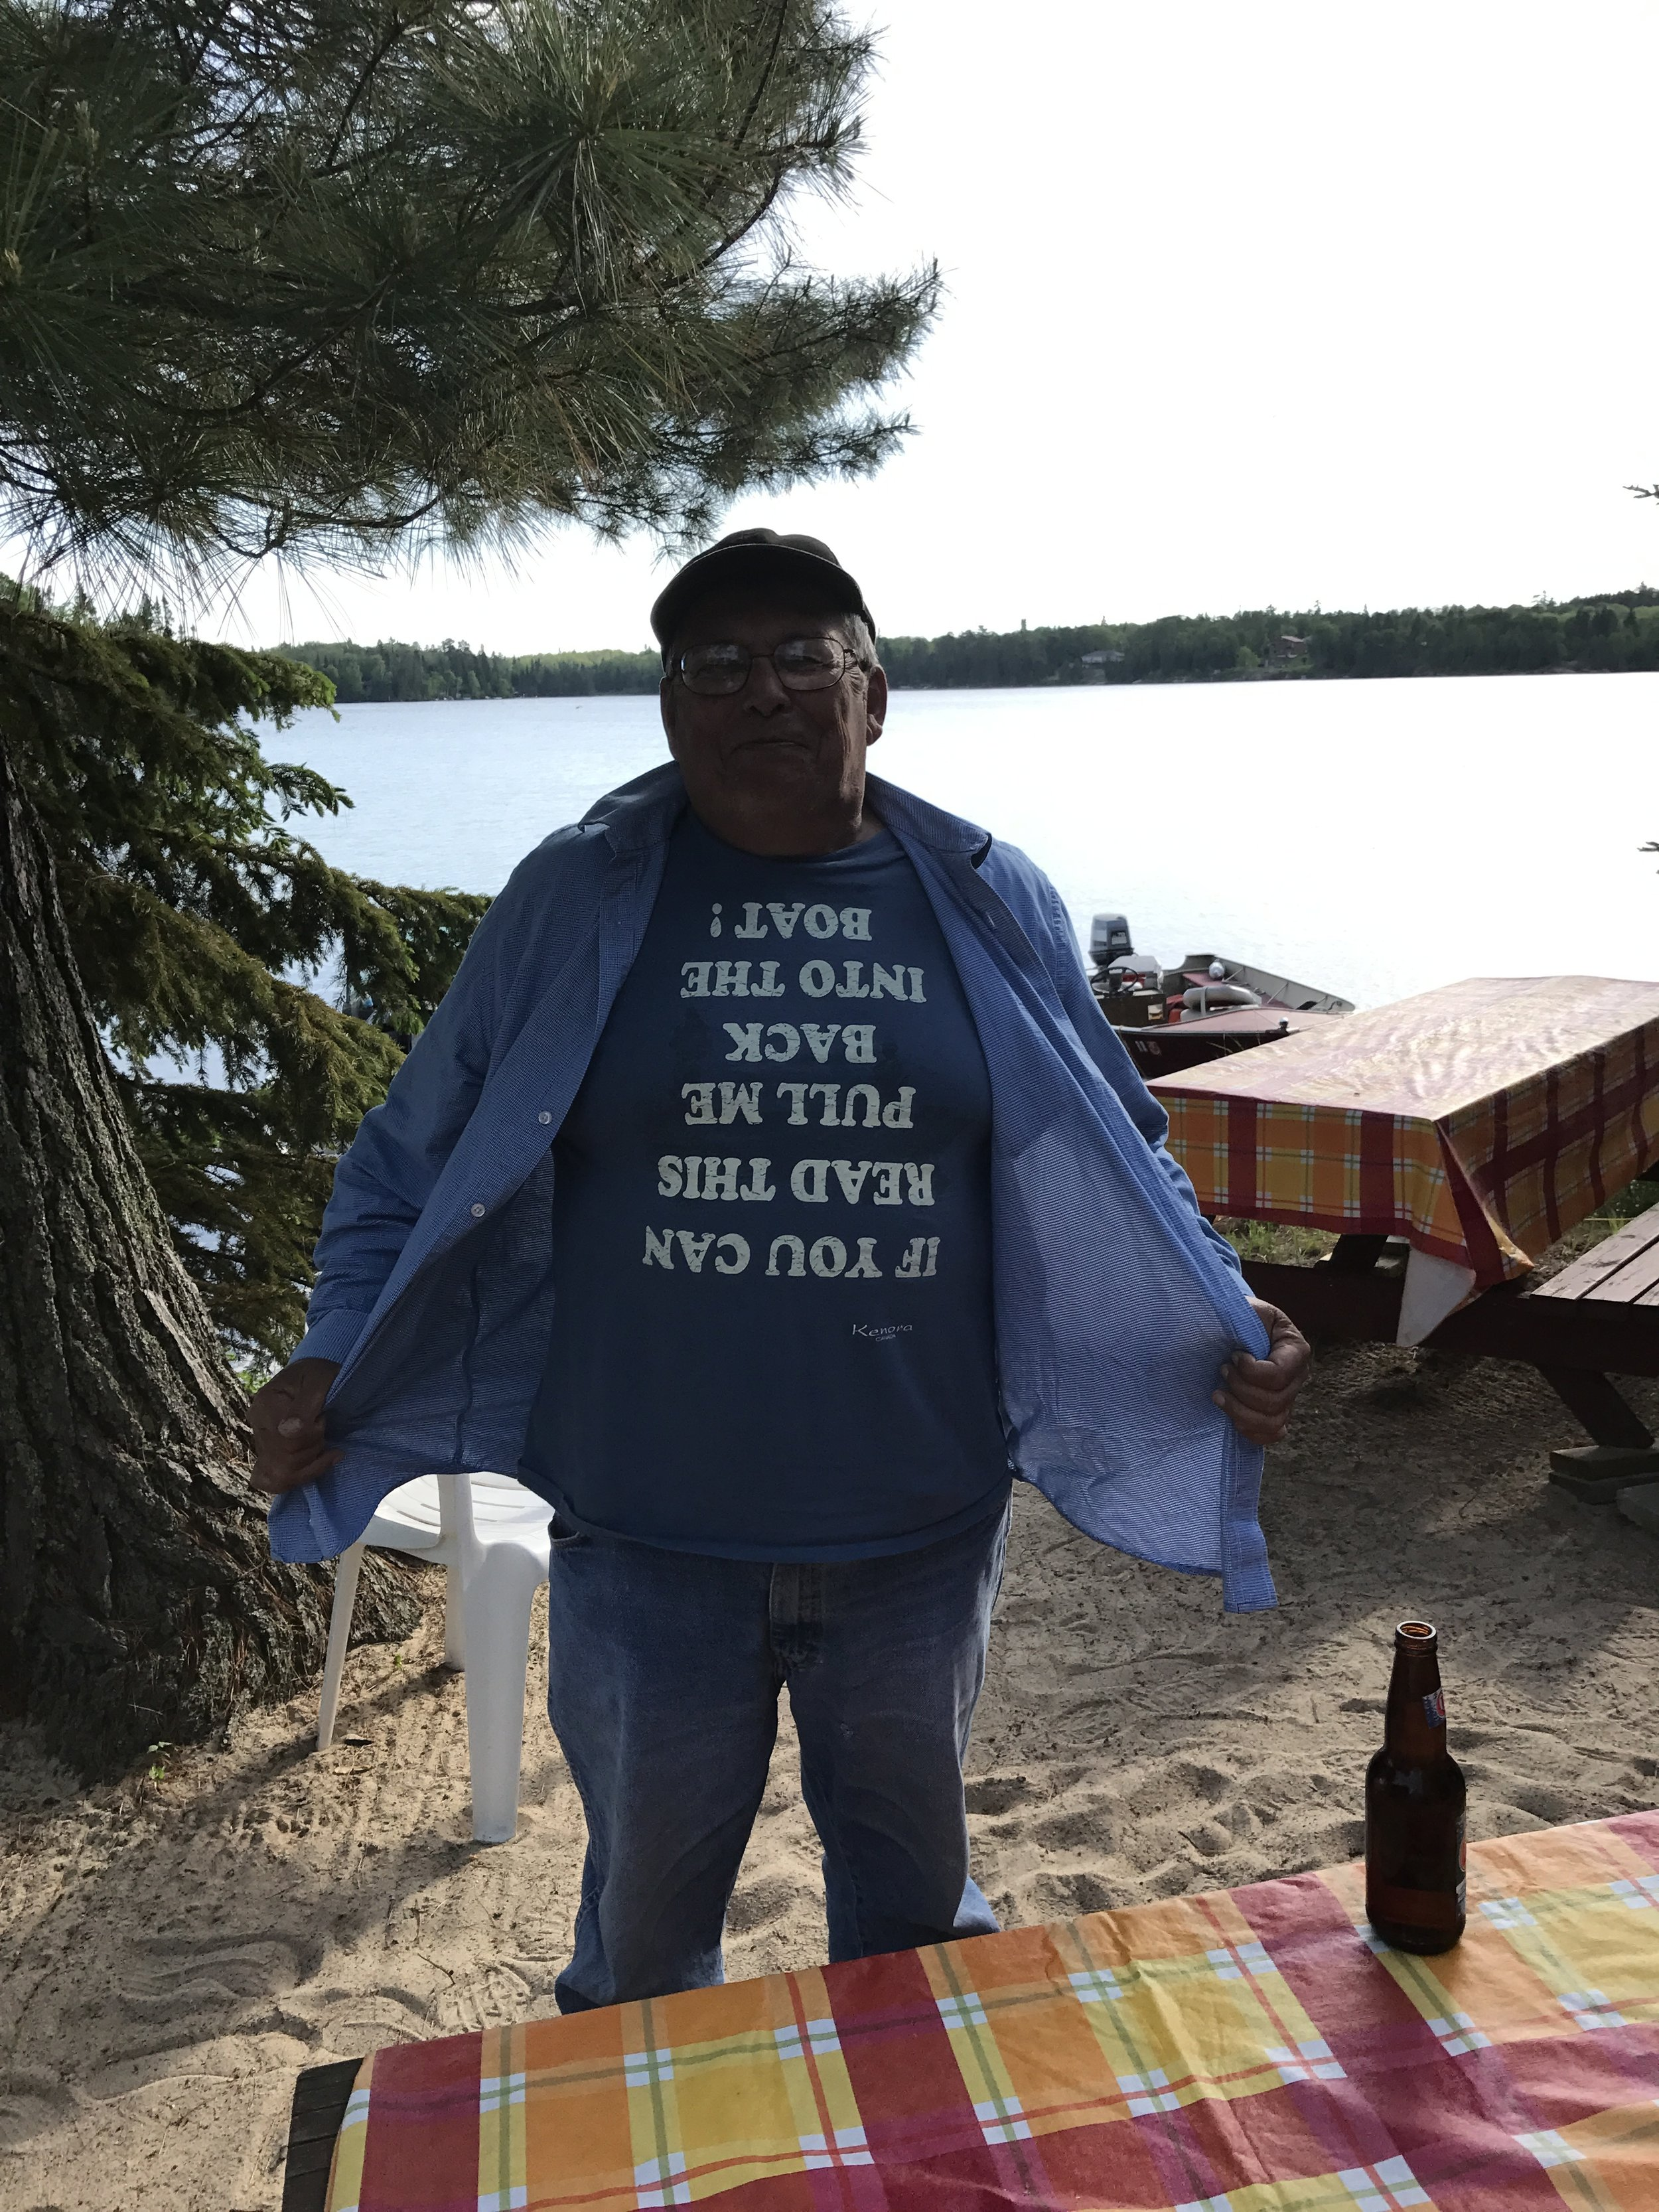 Neat T-Shirt...